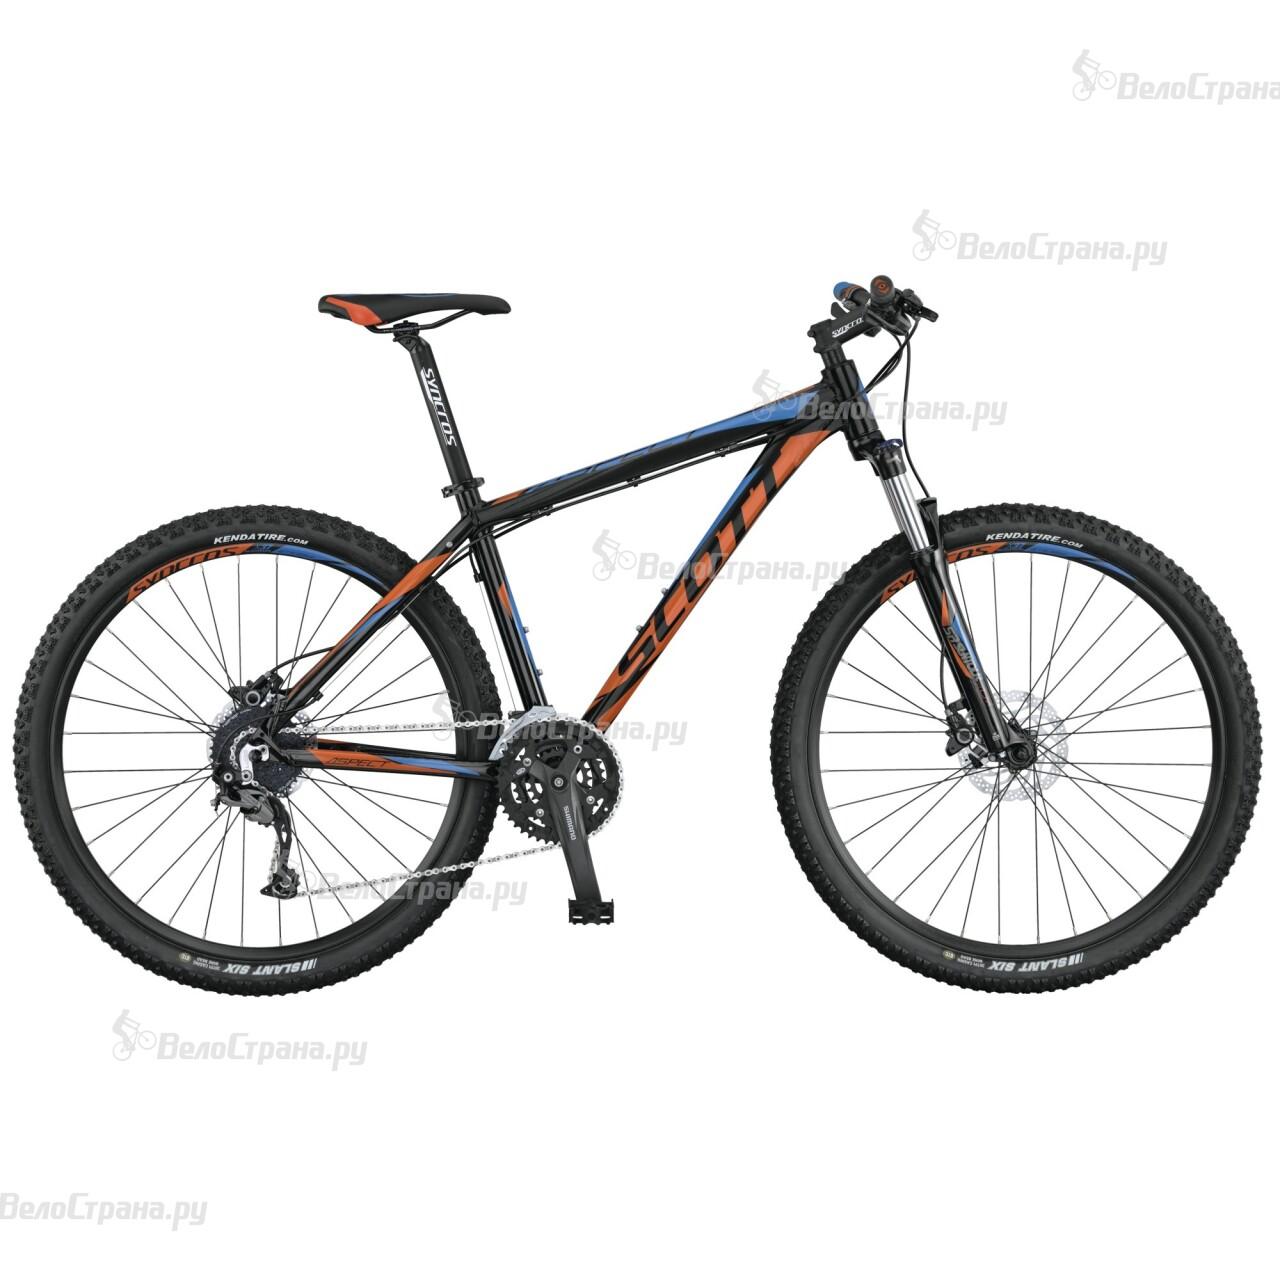 Велосипед Scott Aspect 740 (2015)